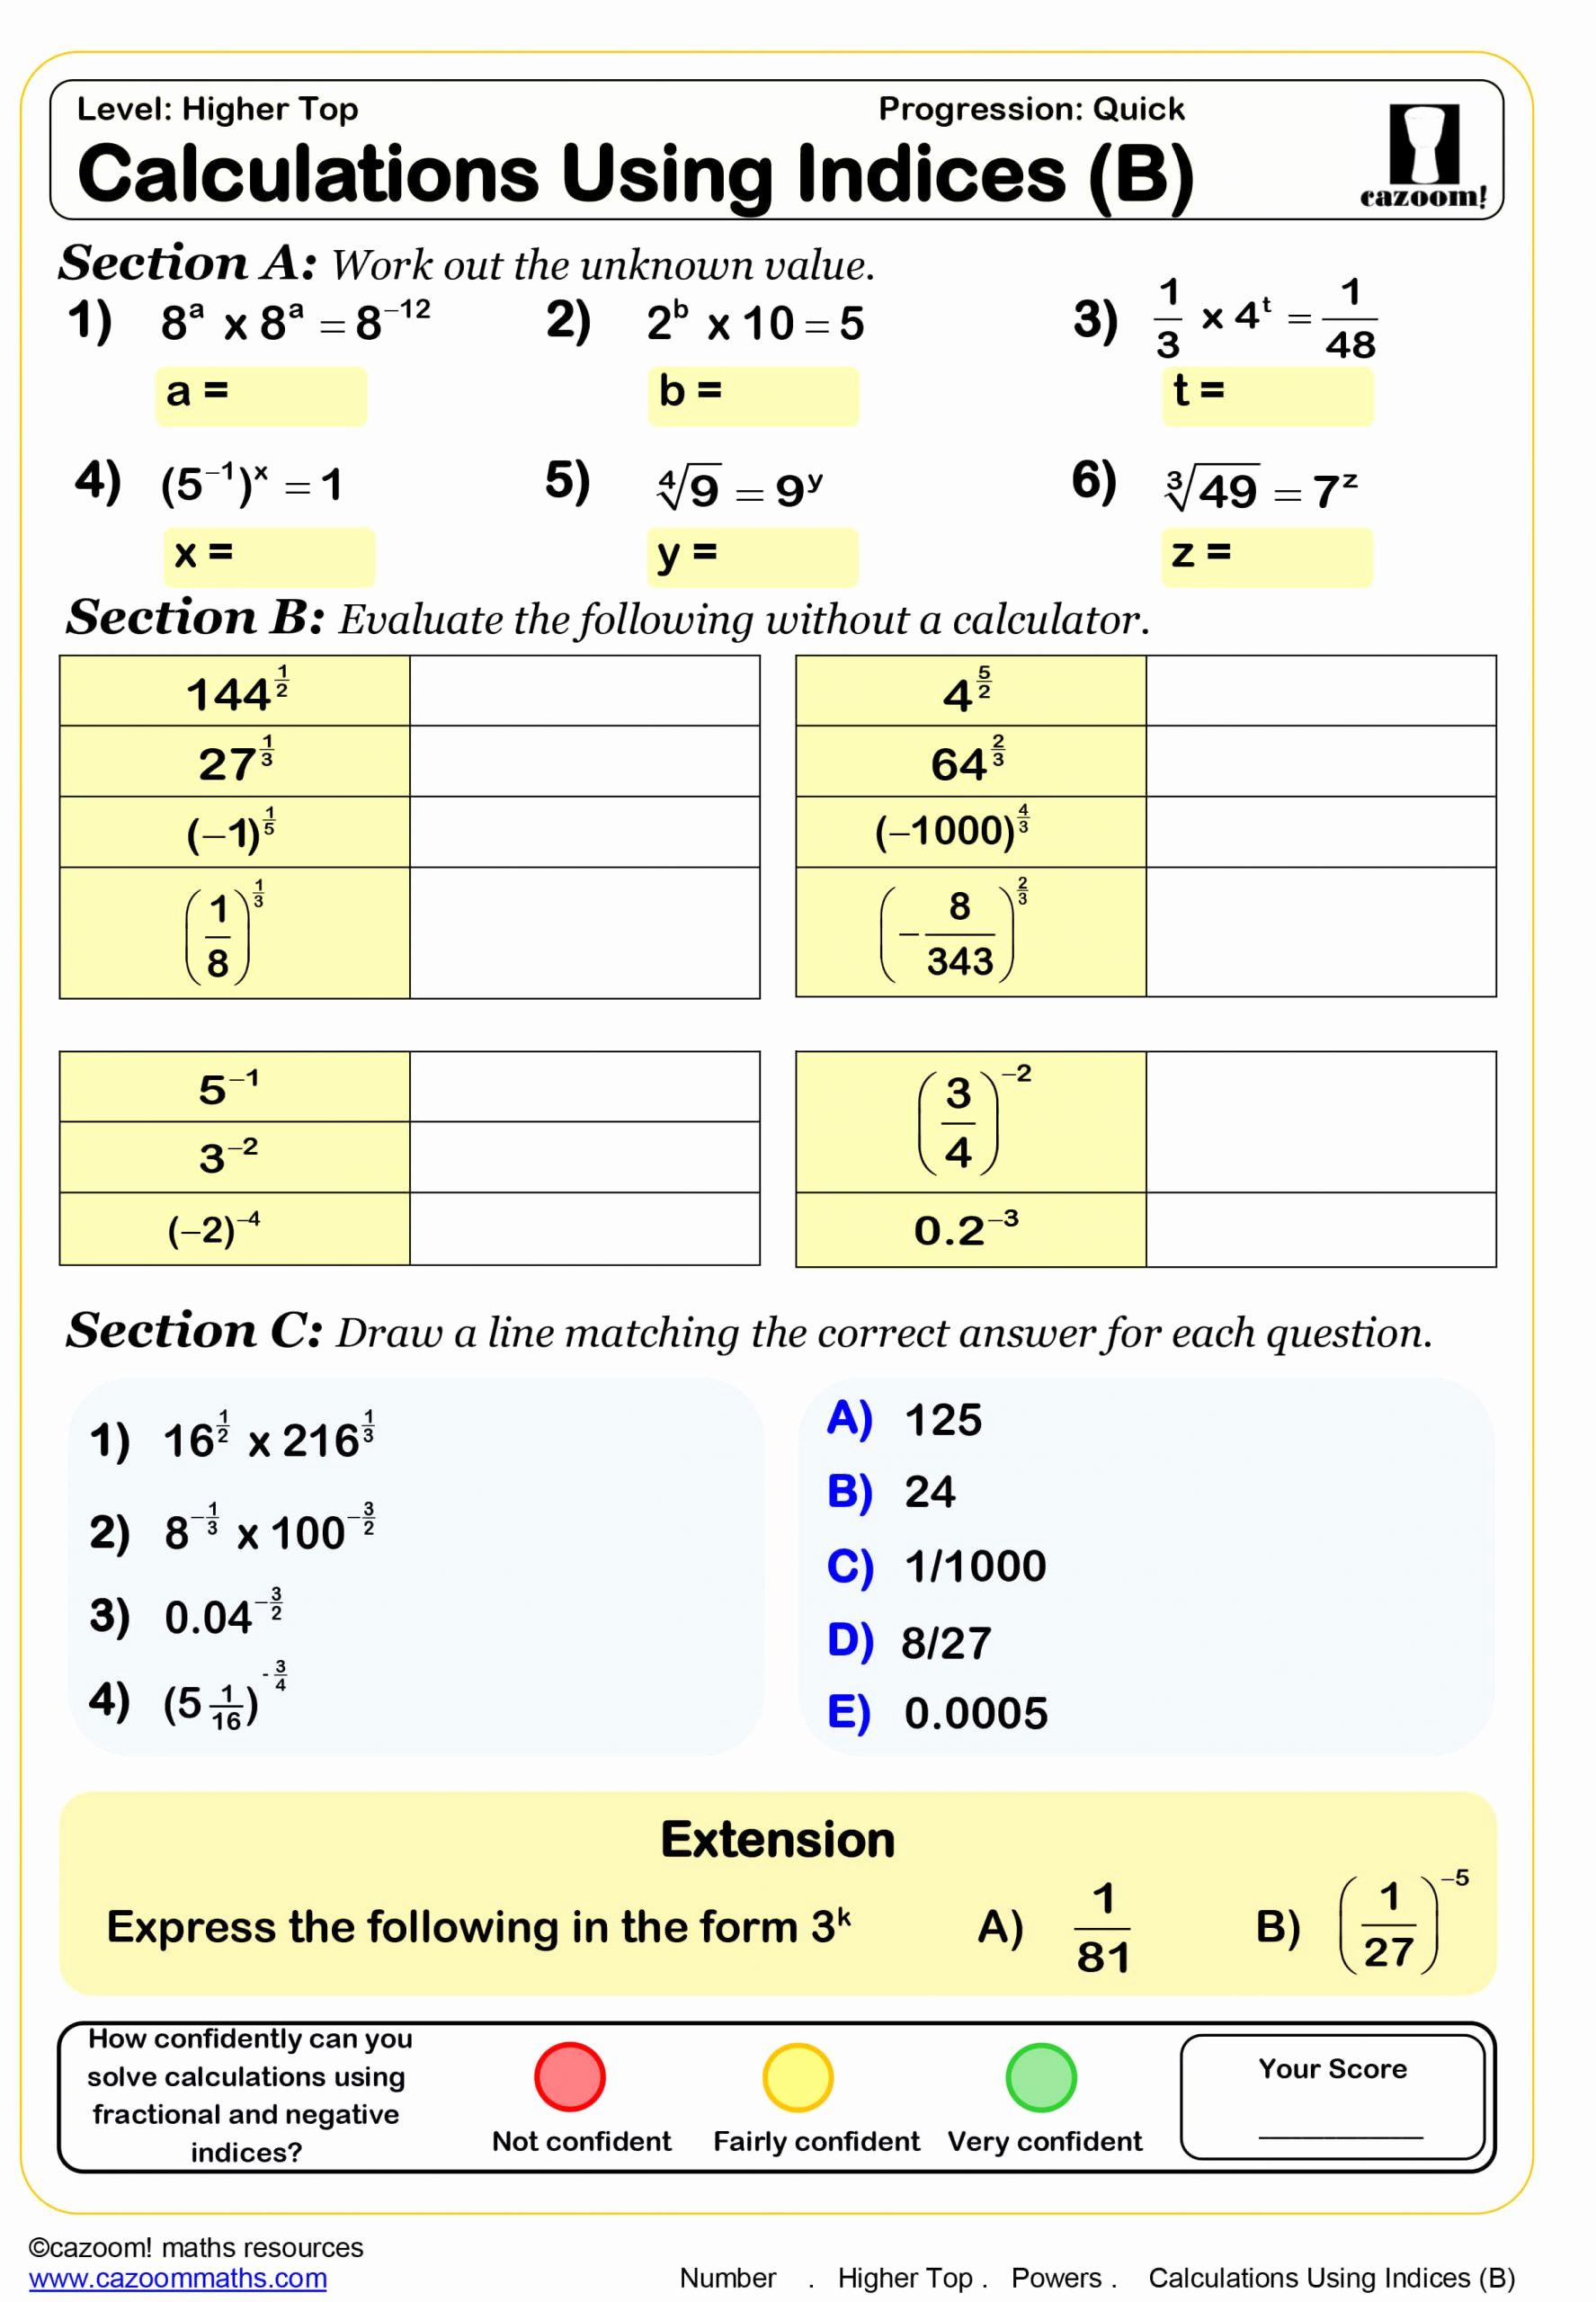 Probability Worksheets High School Pdf Luxury 20 Probability Worksheets High School Pdf